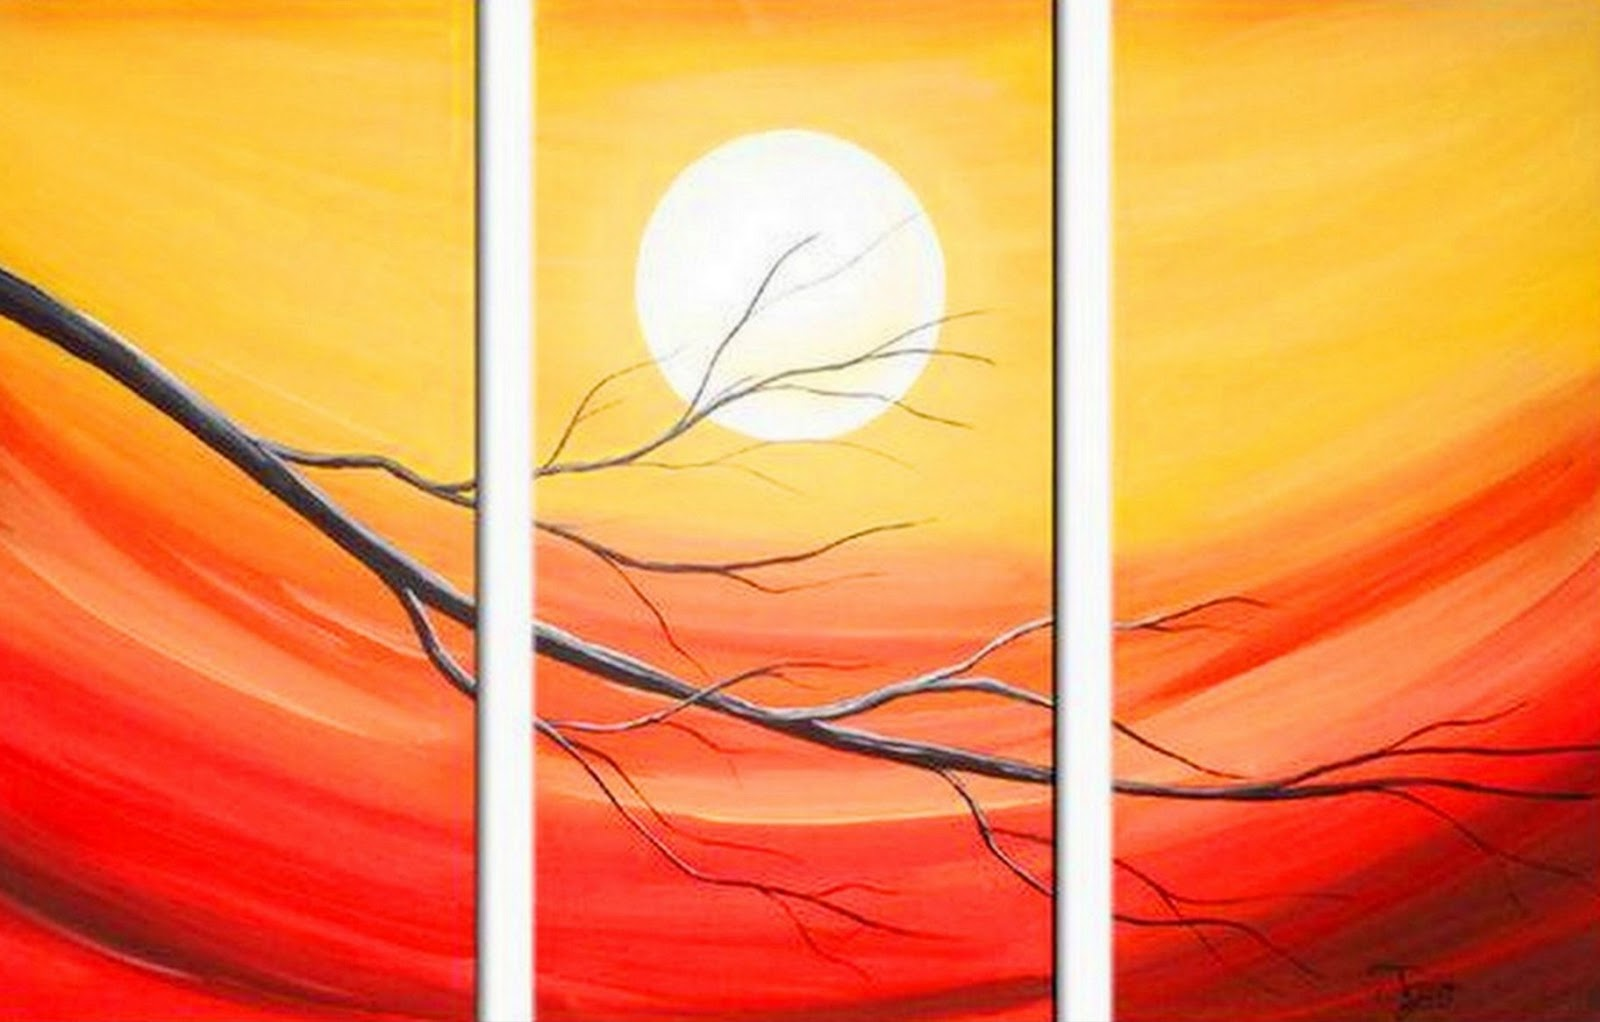 Pintura moderna y fotograf a art stica pinturas al leo - Cuadros para pintar en casa ...